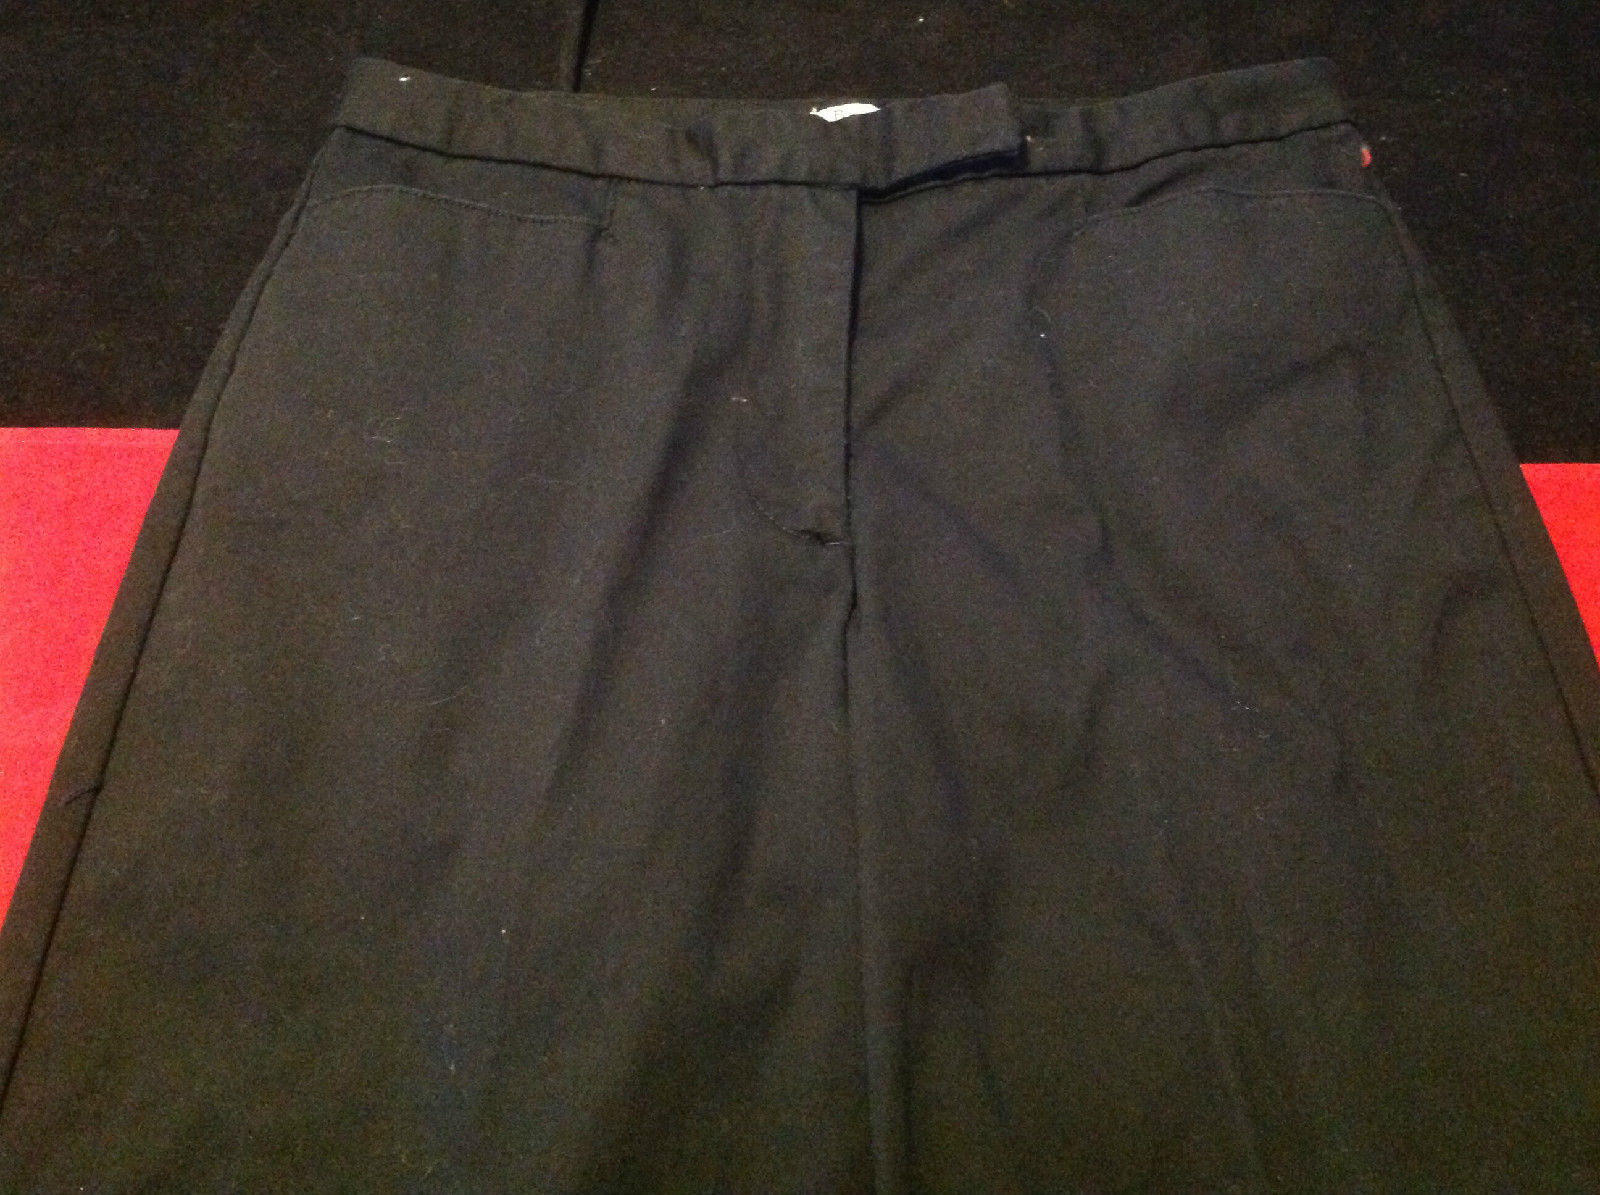 Bass Stretch Ladies Black Pants Size 6